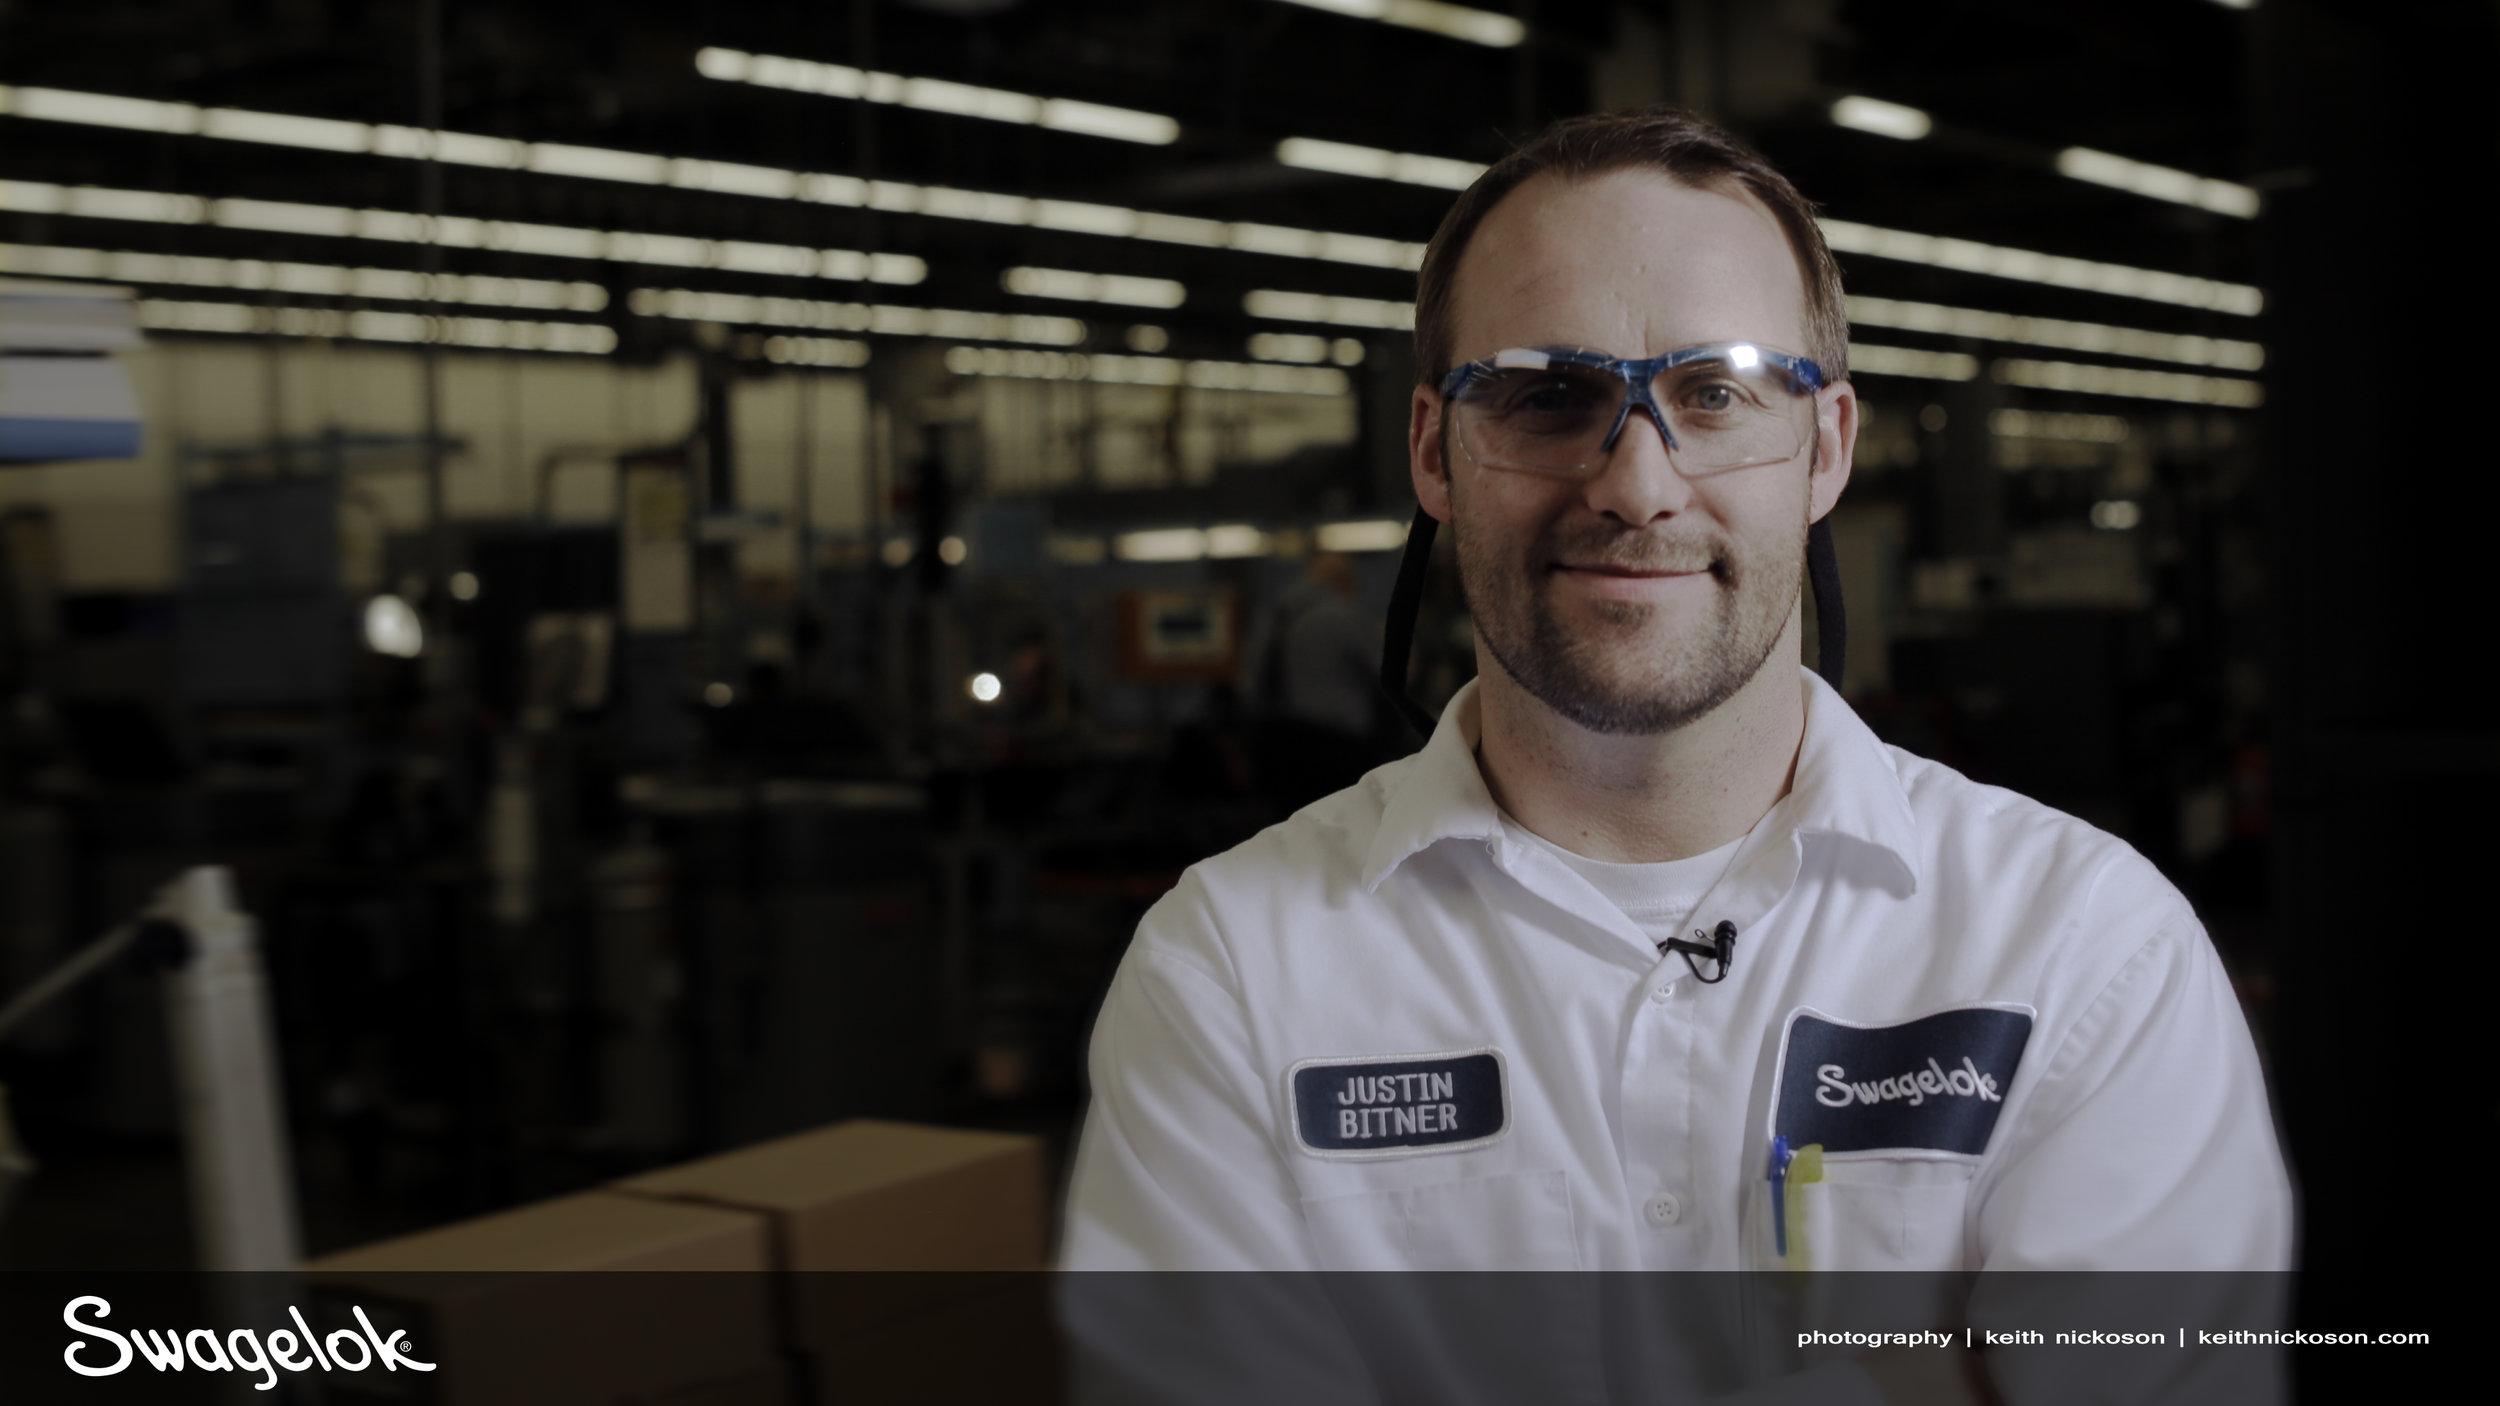 Swagelok Worker 5 - Keith Nickoson.jpg